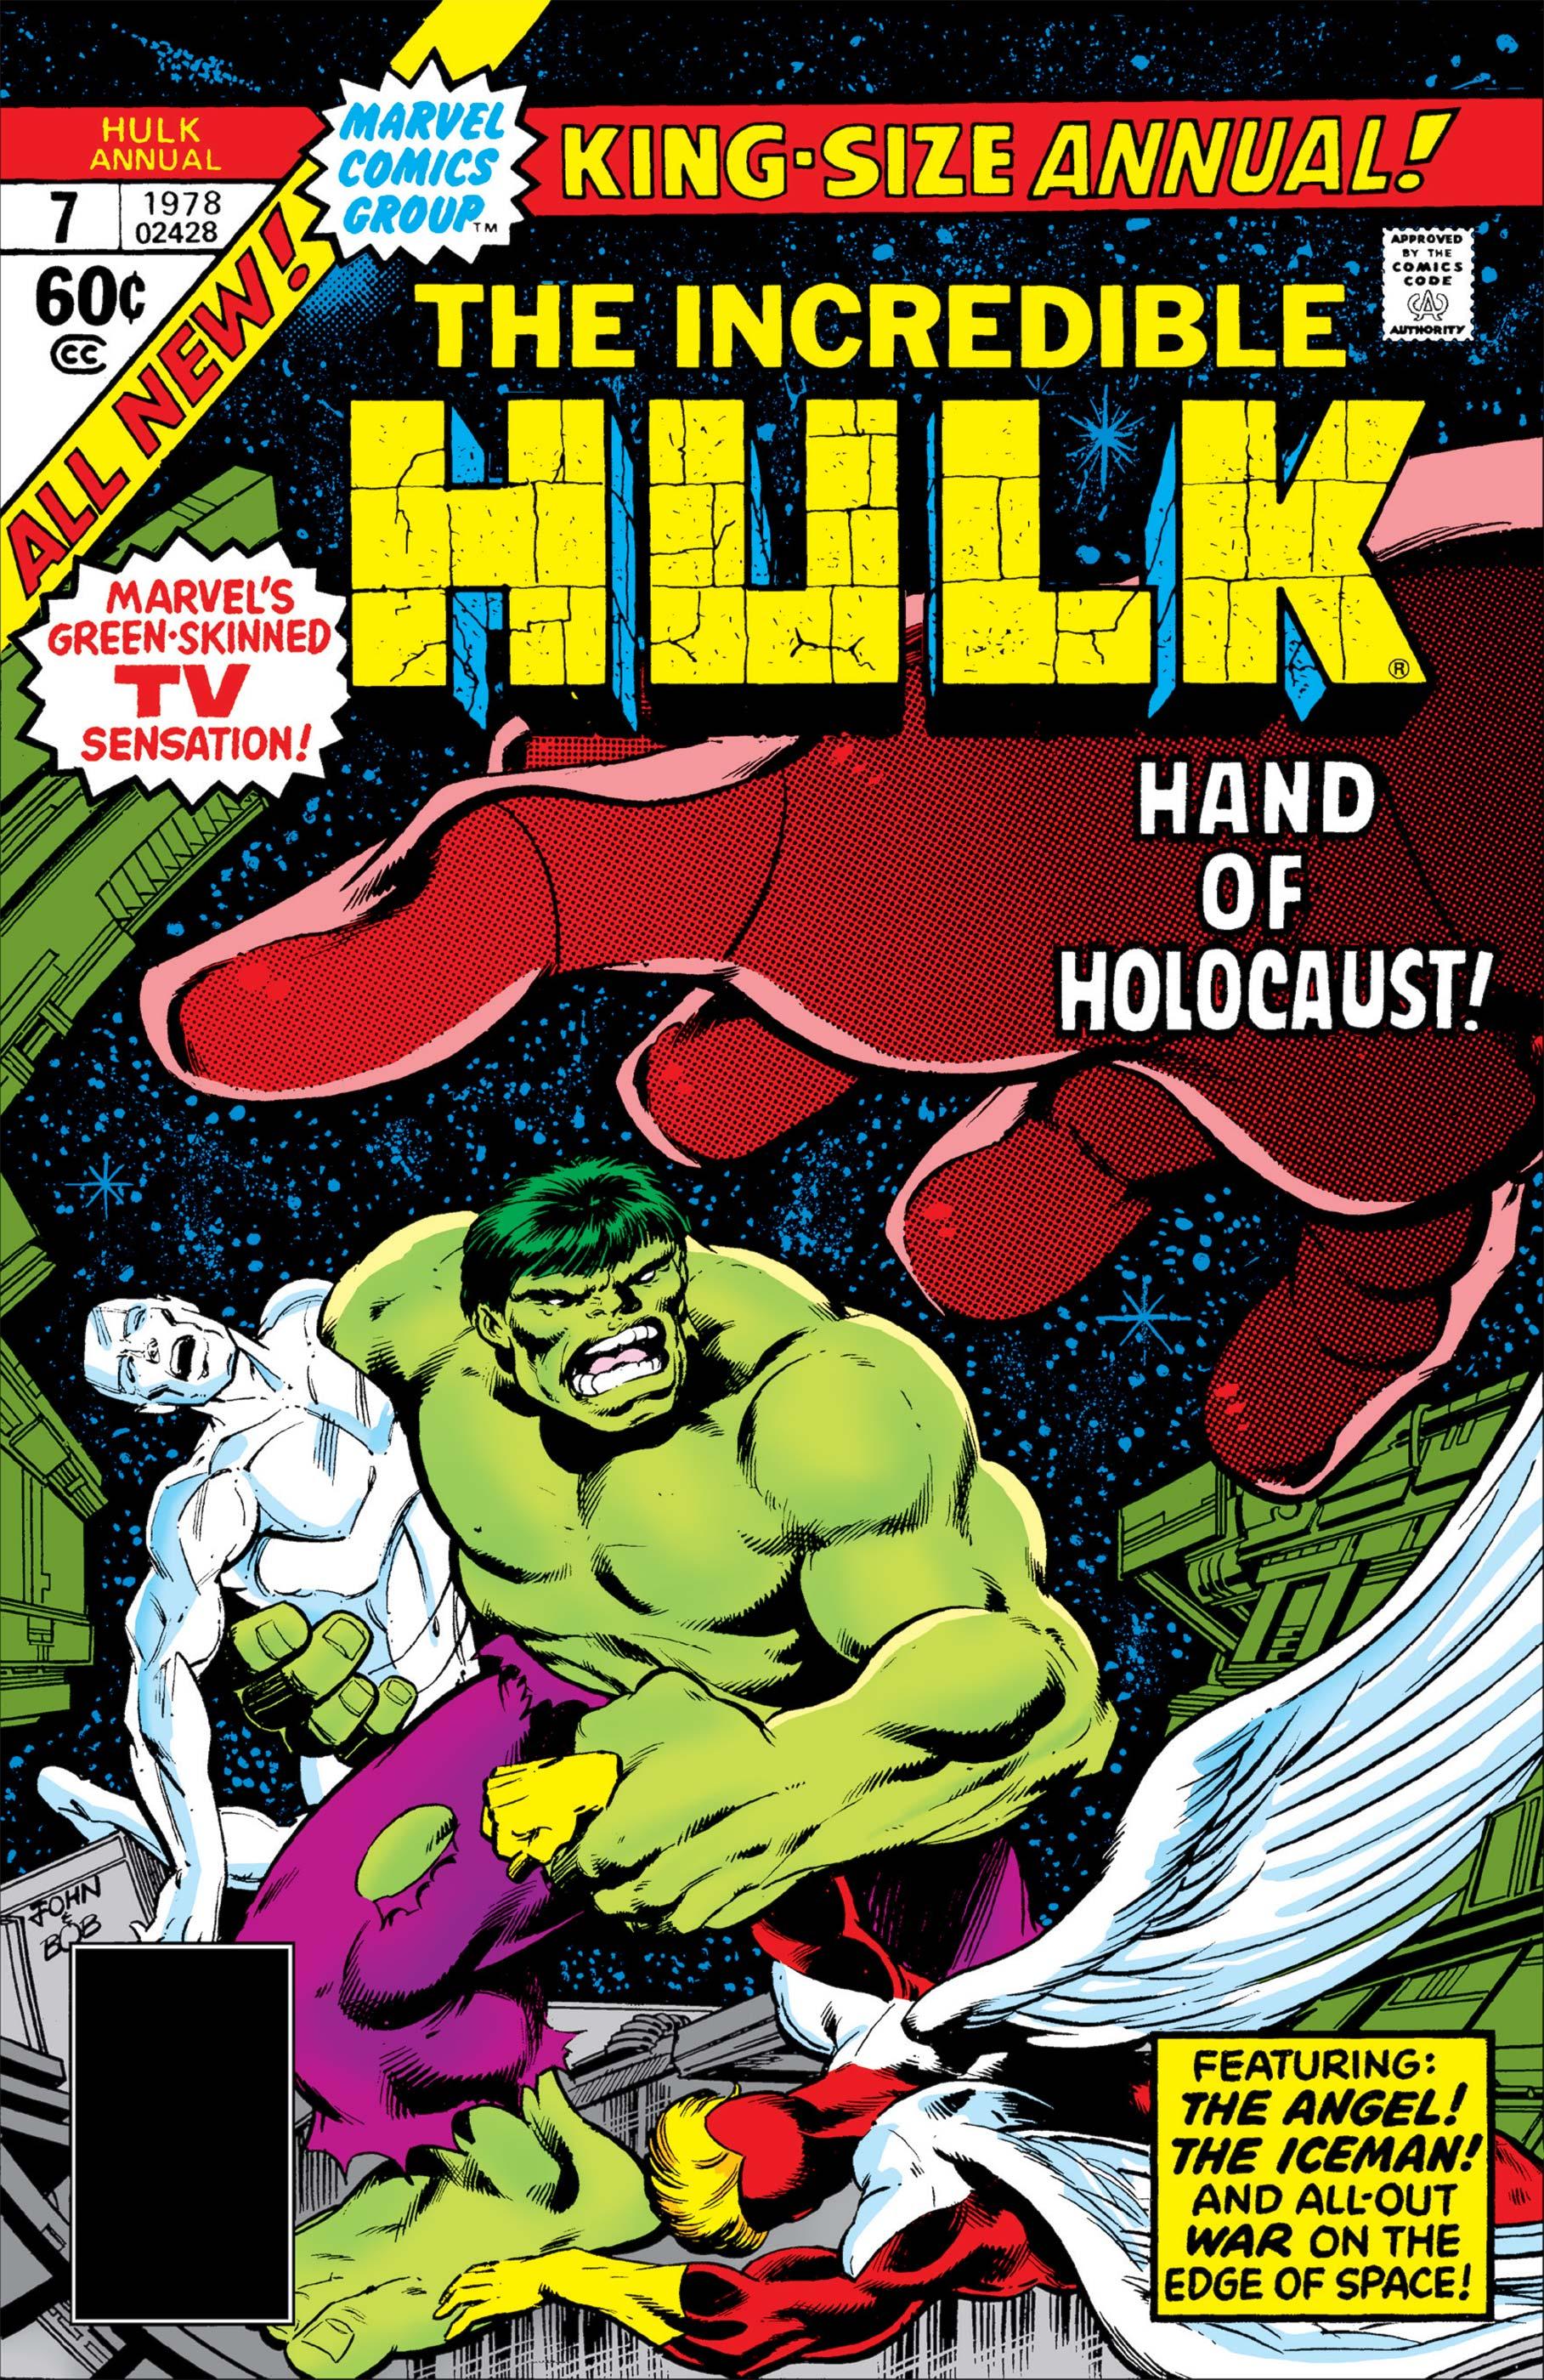 Incredible Hulk Annual (1976) #7